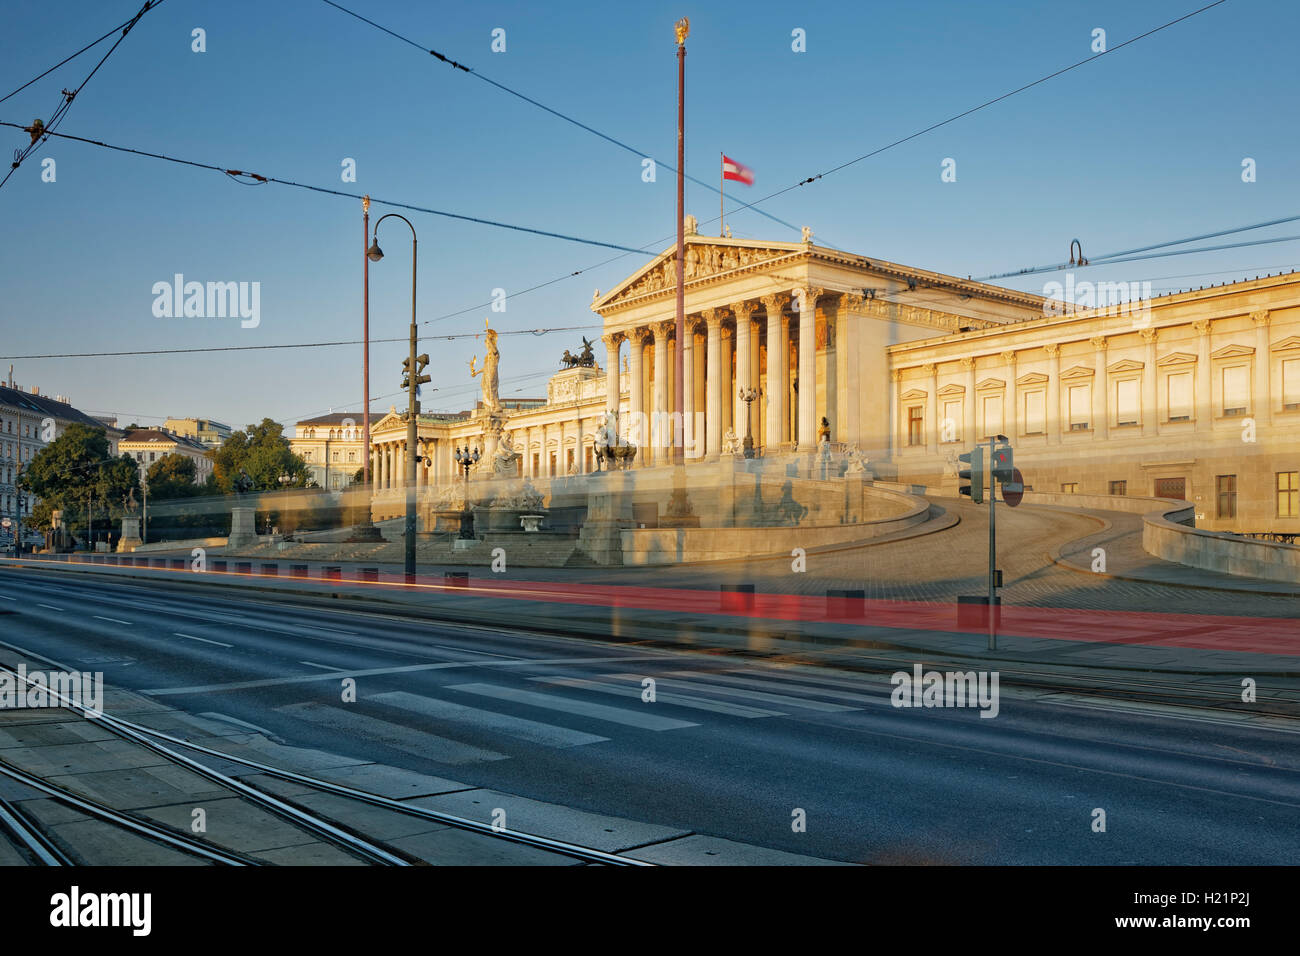 Austria, Vienna, Austrian Parliament, Light trail of tram - Stock Image